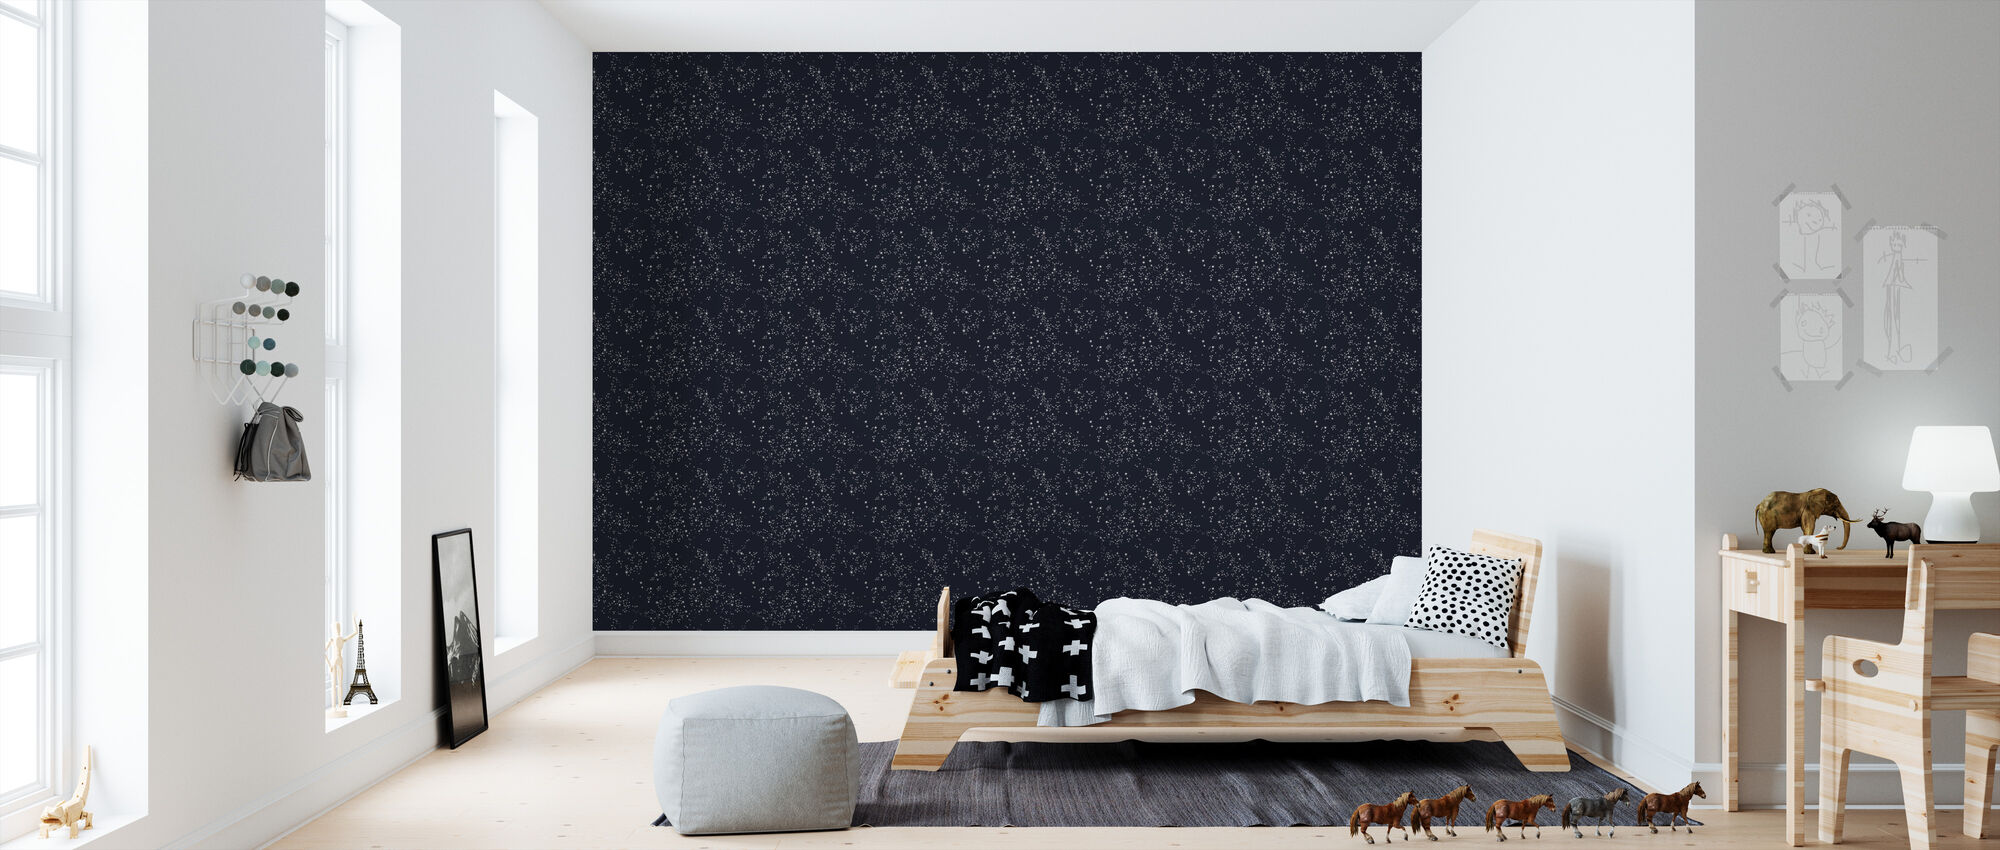 Star Sky - Wallpaper - Kids Room